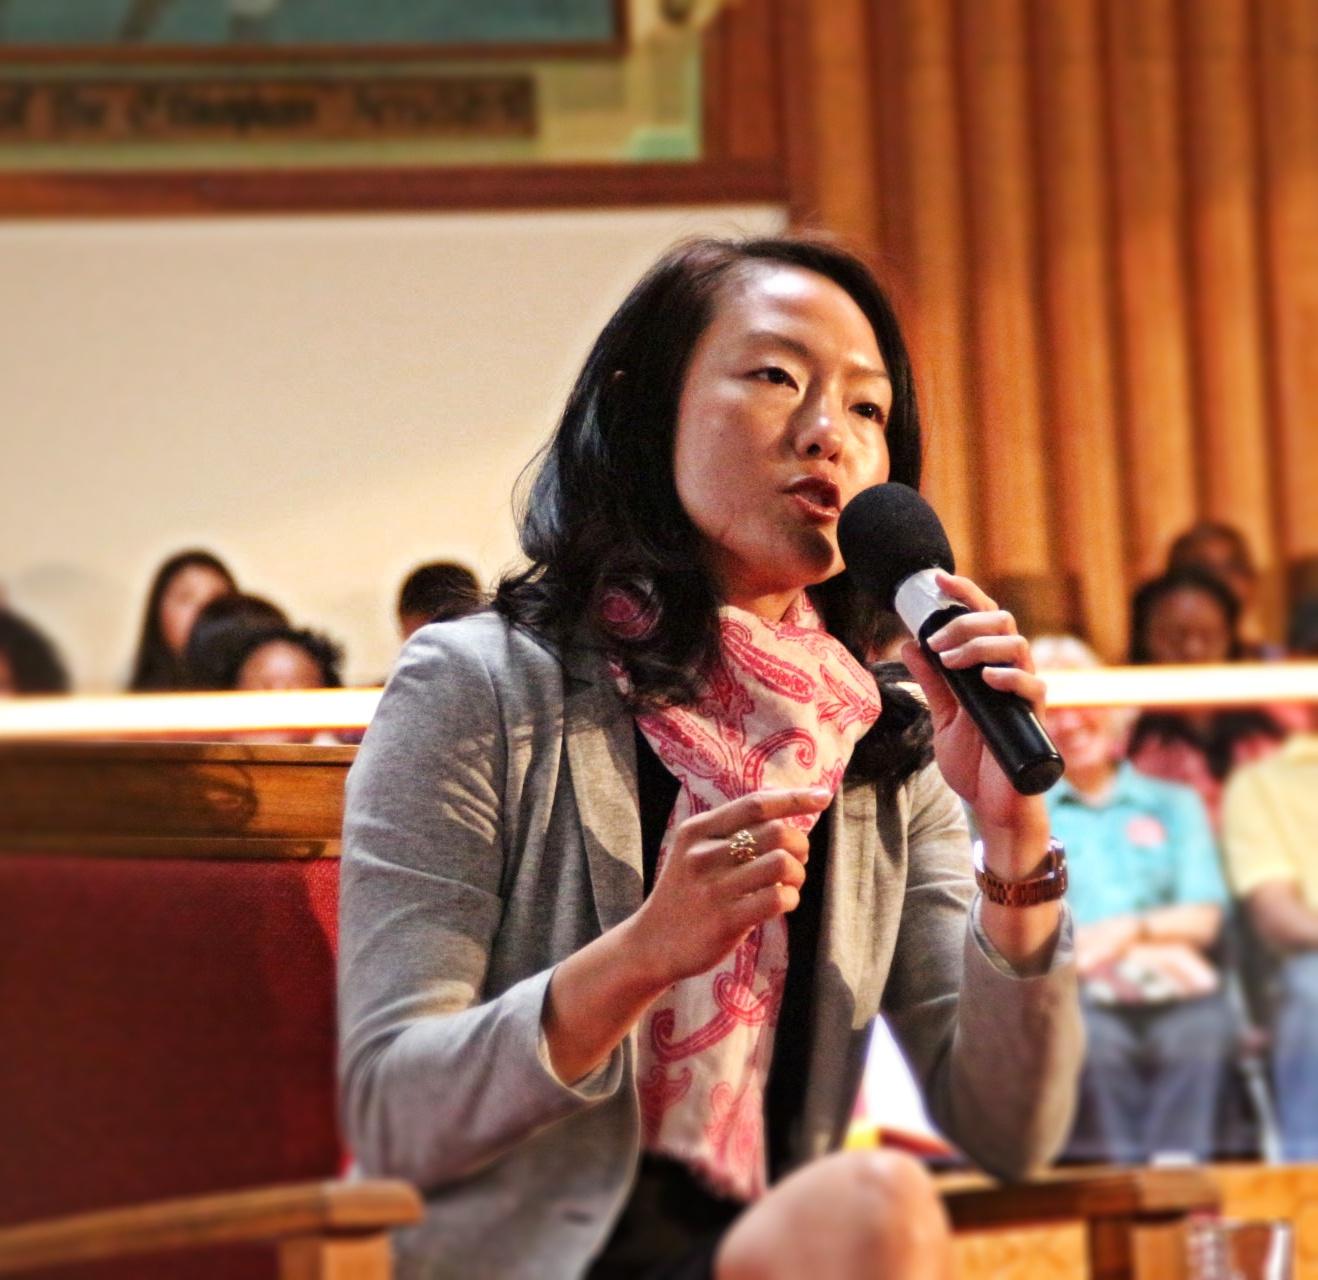 Sup Jane Kim speaks at the Allen Temple Baptist Church. Photo by Sana Saleem.